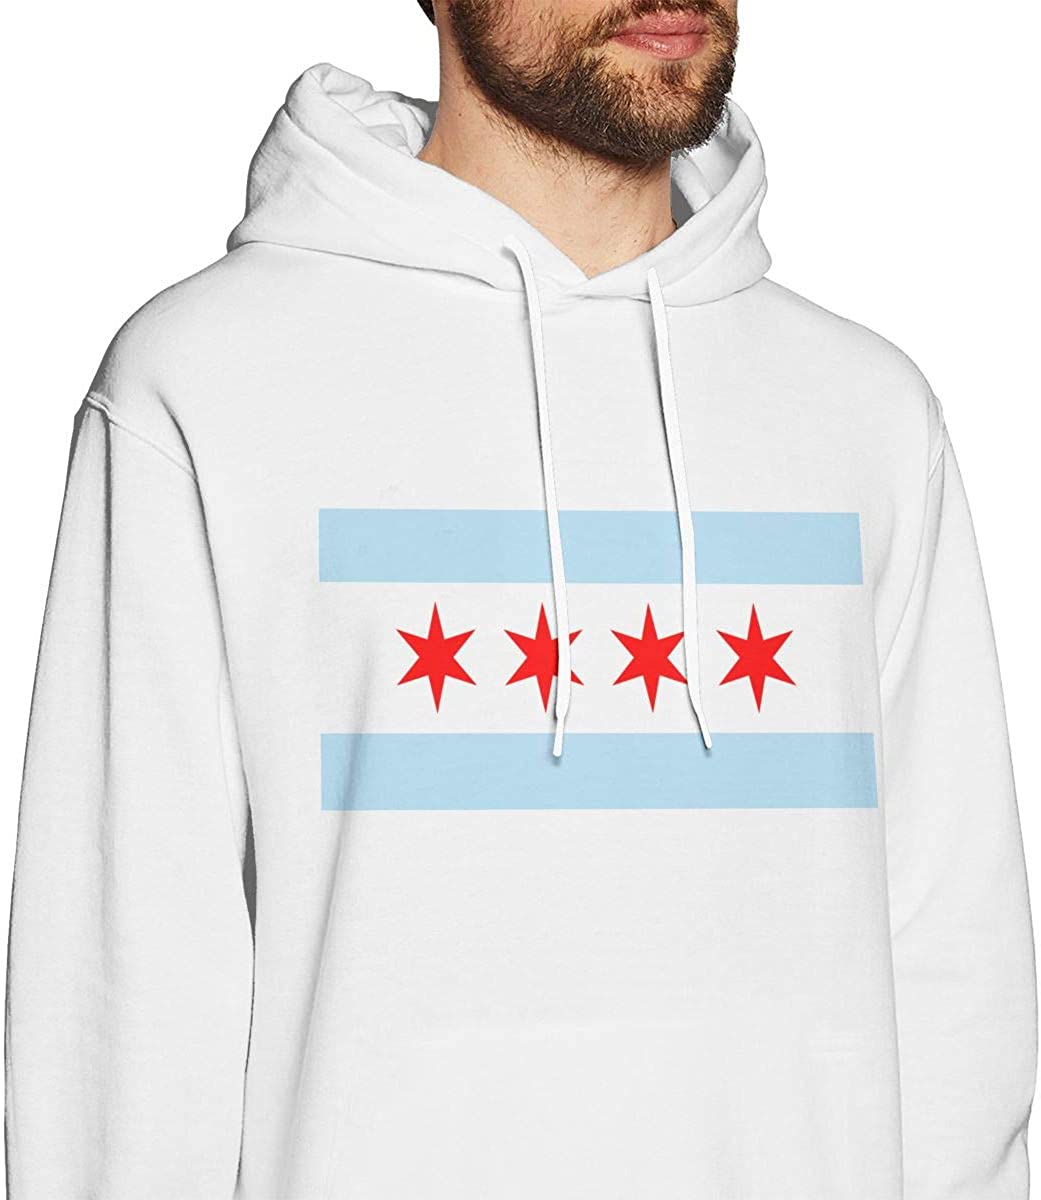 Mens Hoodies Chicago Flag Fashion Pullover Hooded Print Sweatshirt Jackets